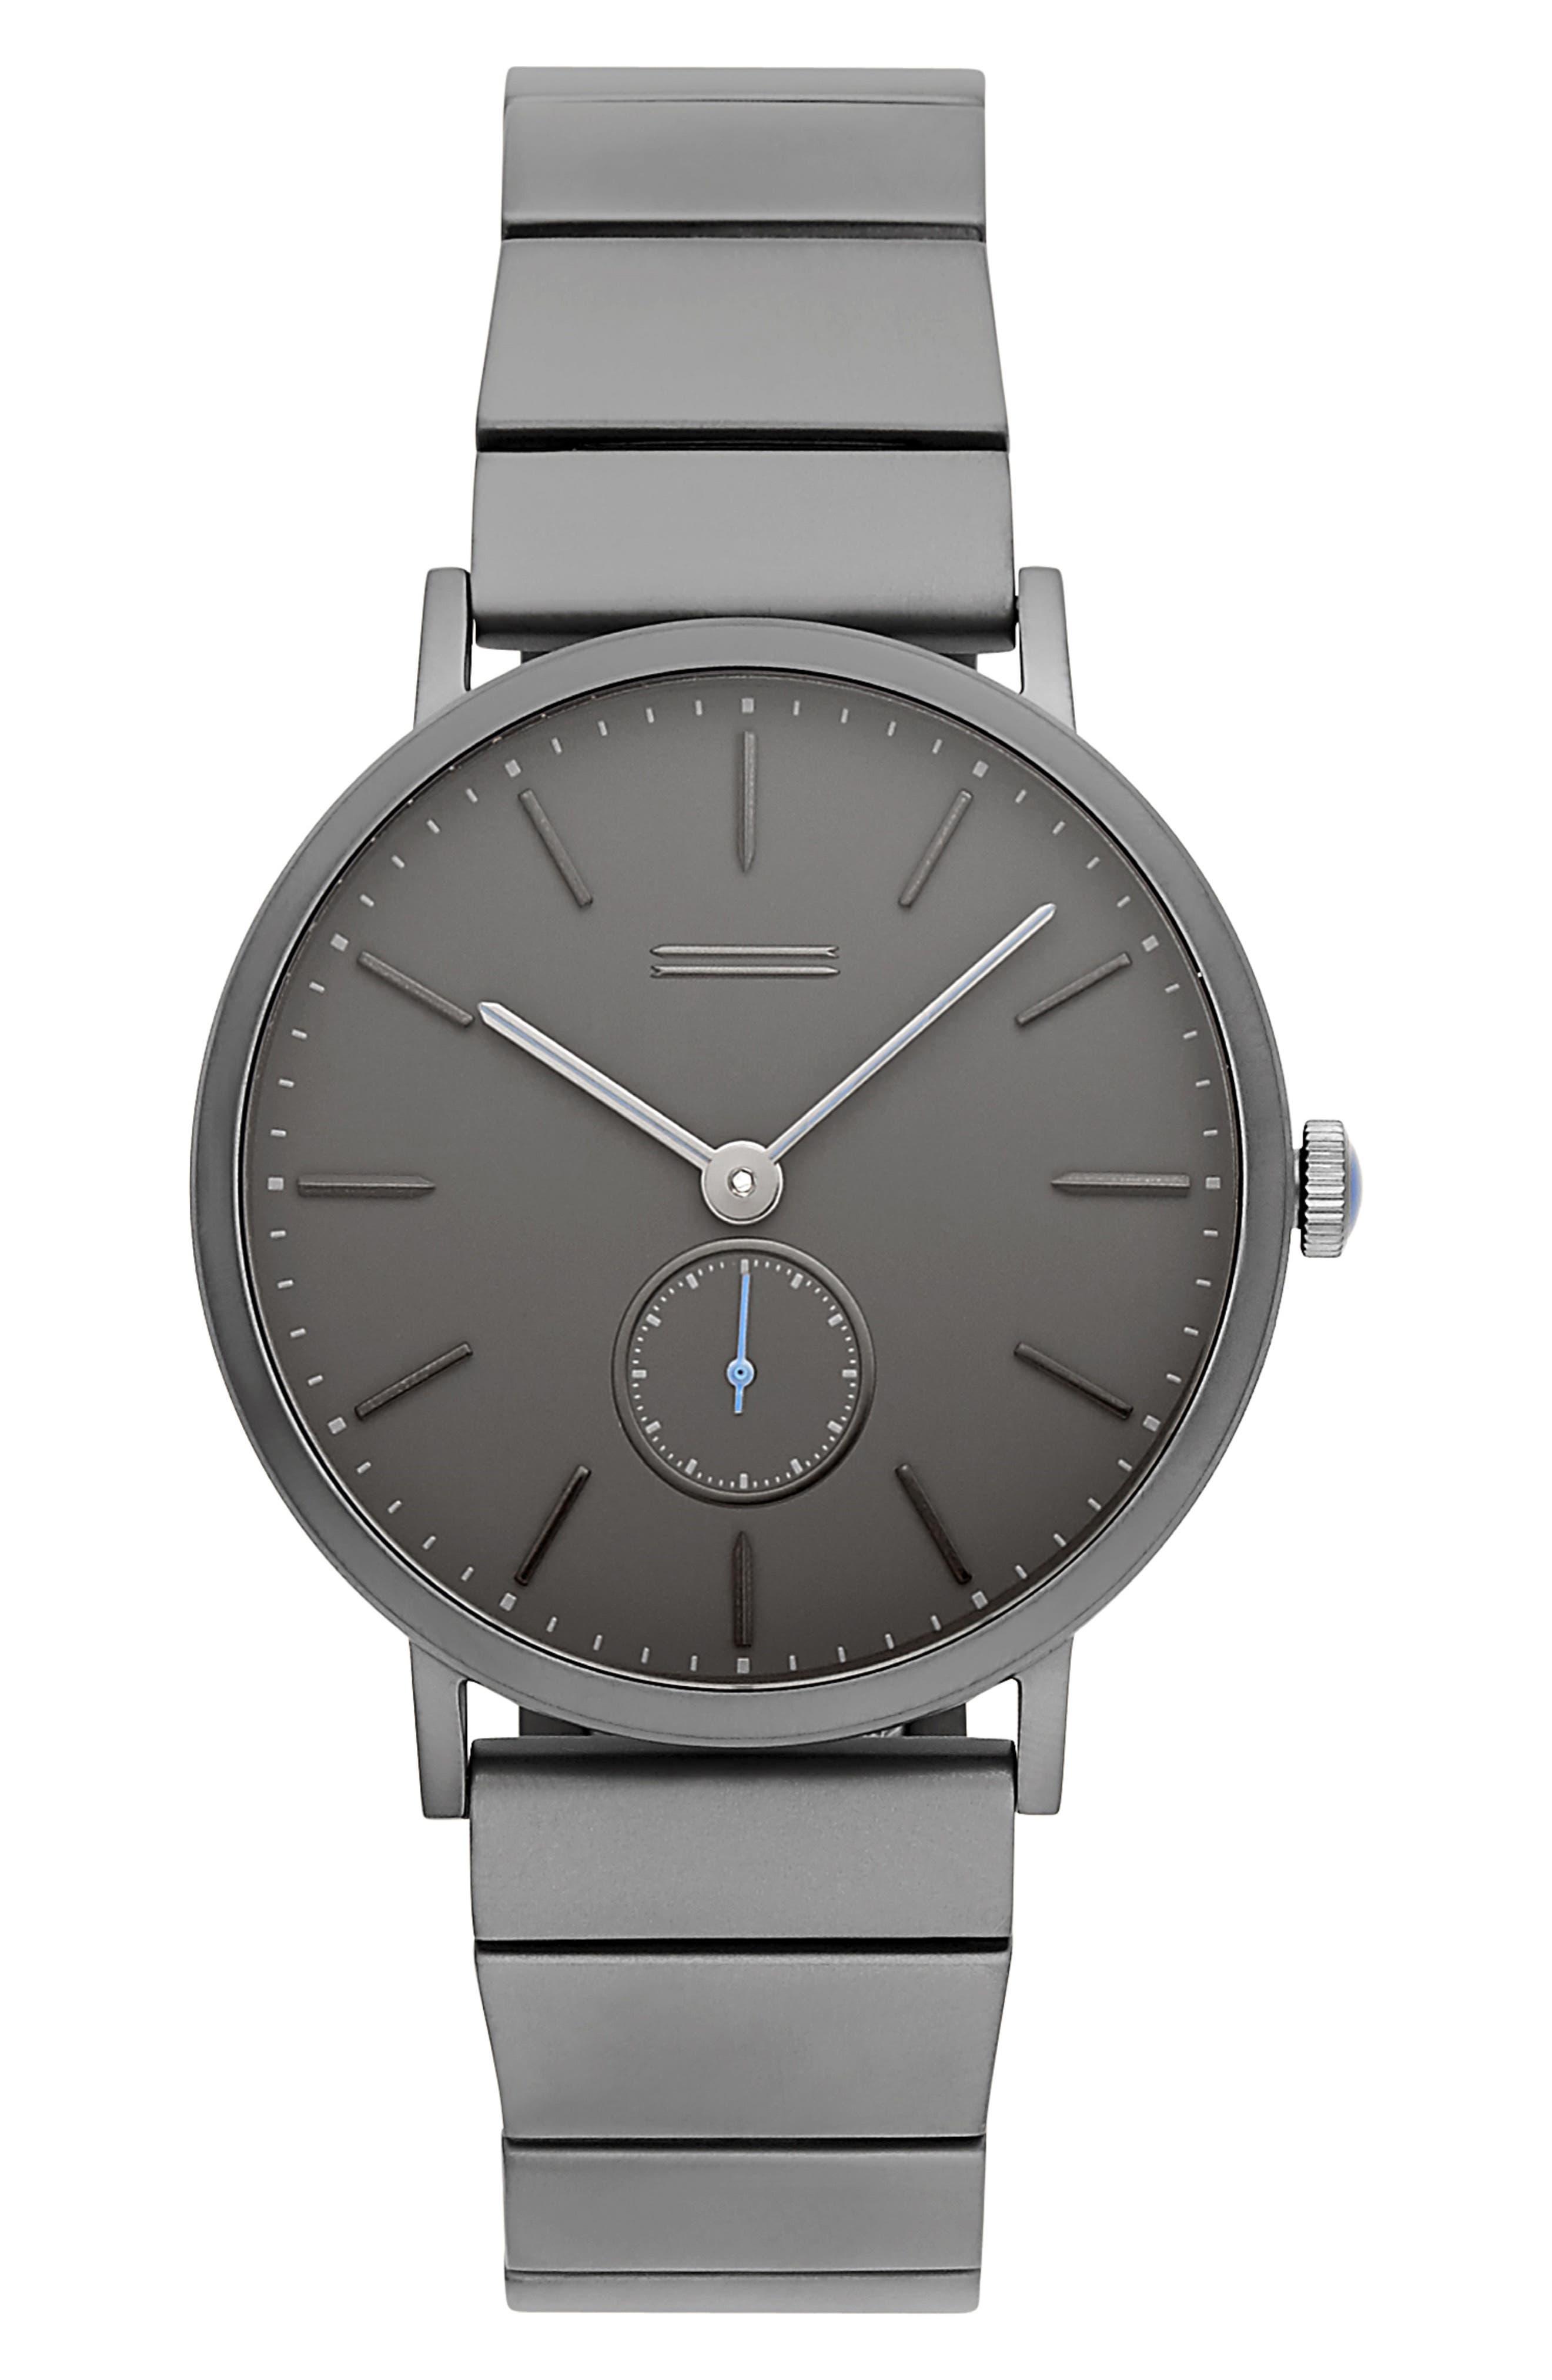 URI MINKOFF Norrebro Bracelet Watch, 40Mm in Grey